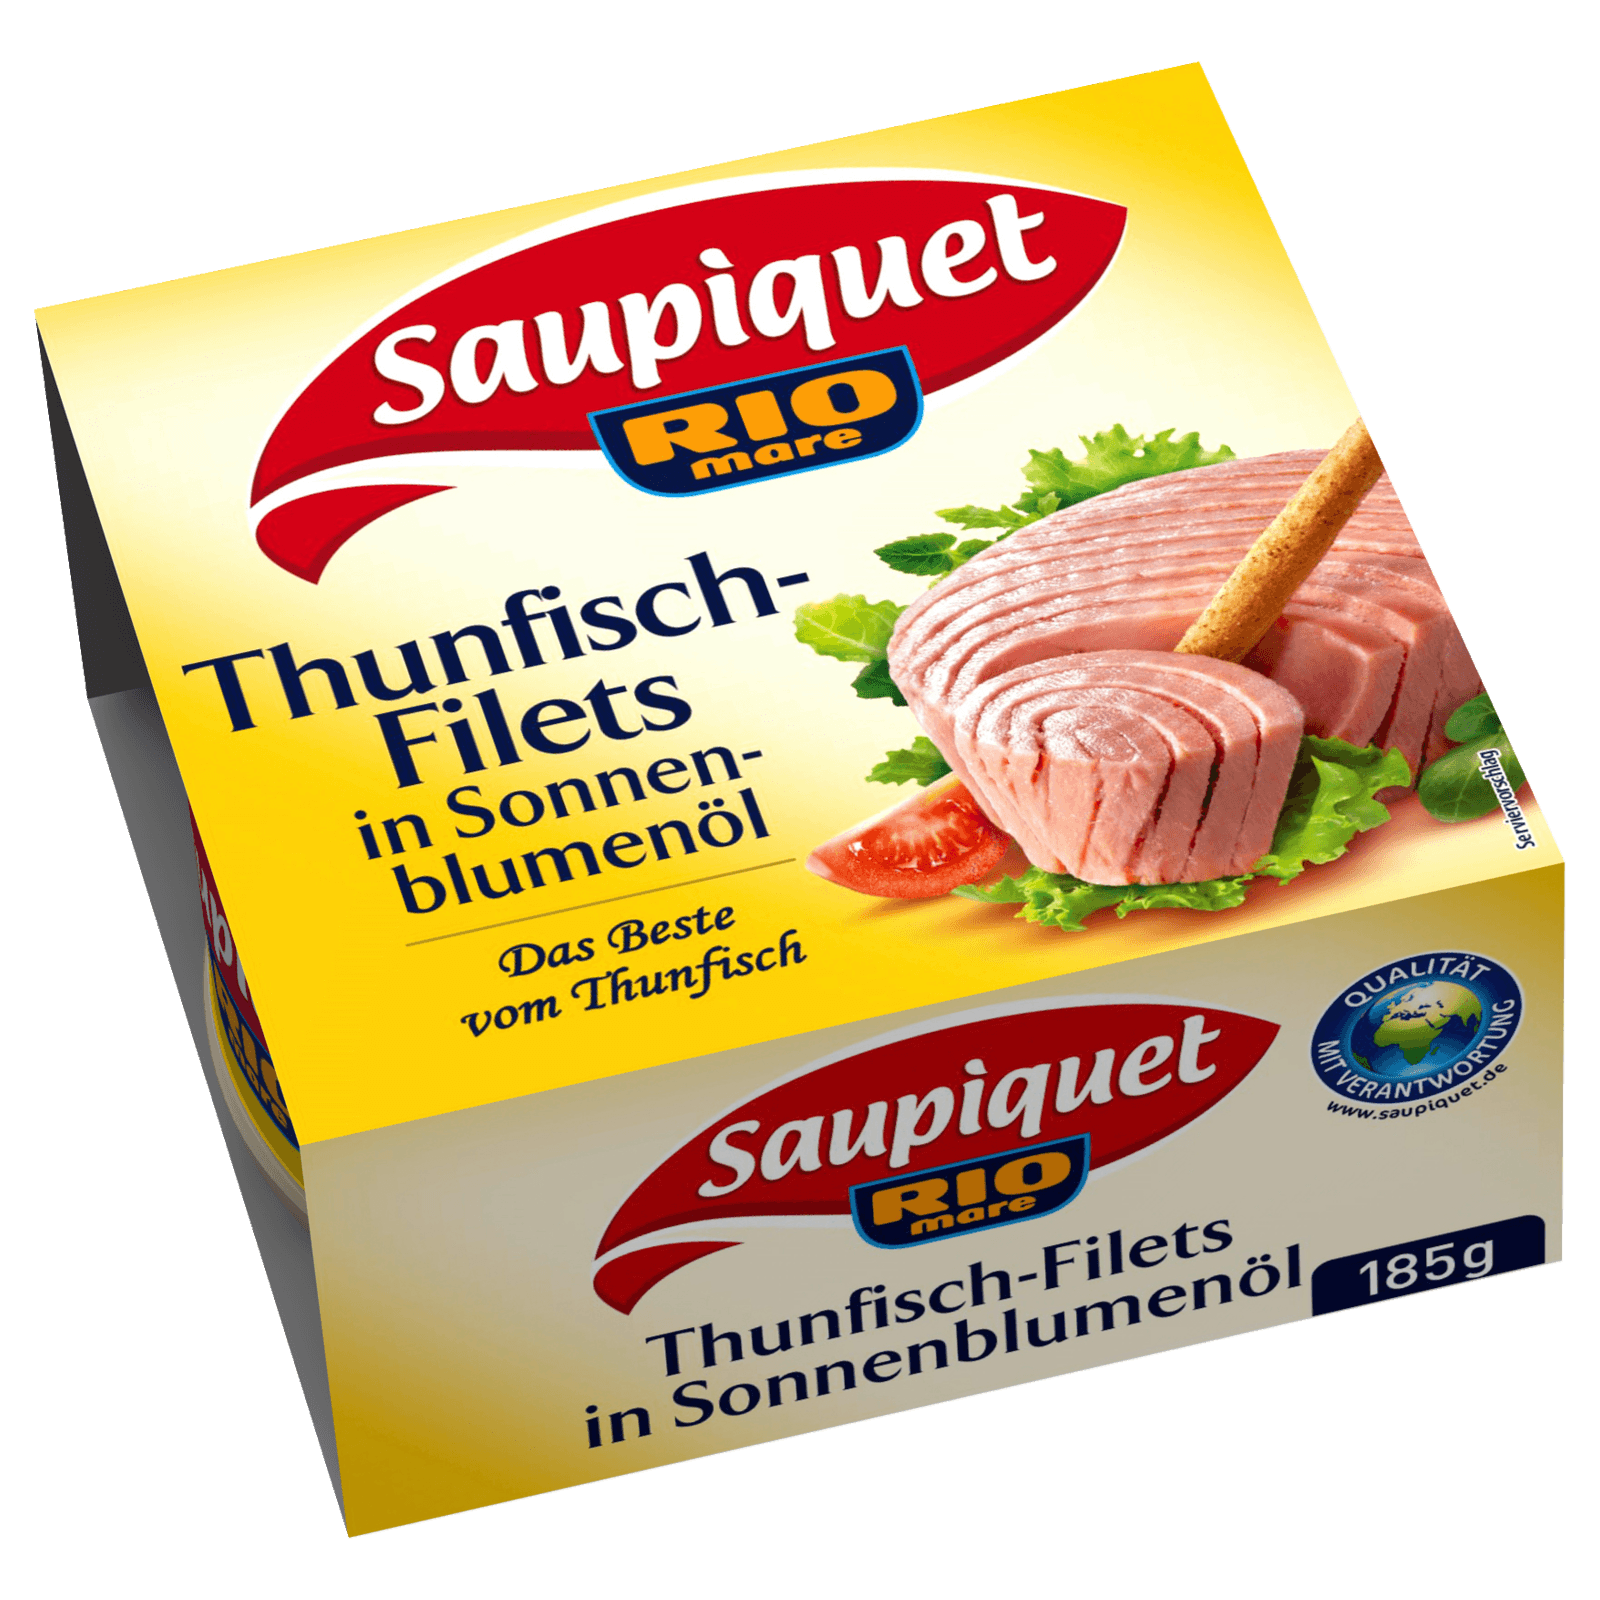 Saupiquet Thunfisch-Filets in Sonnenblumenöl 130g